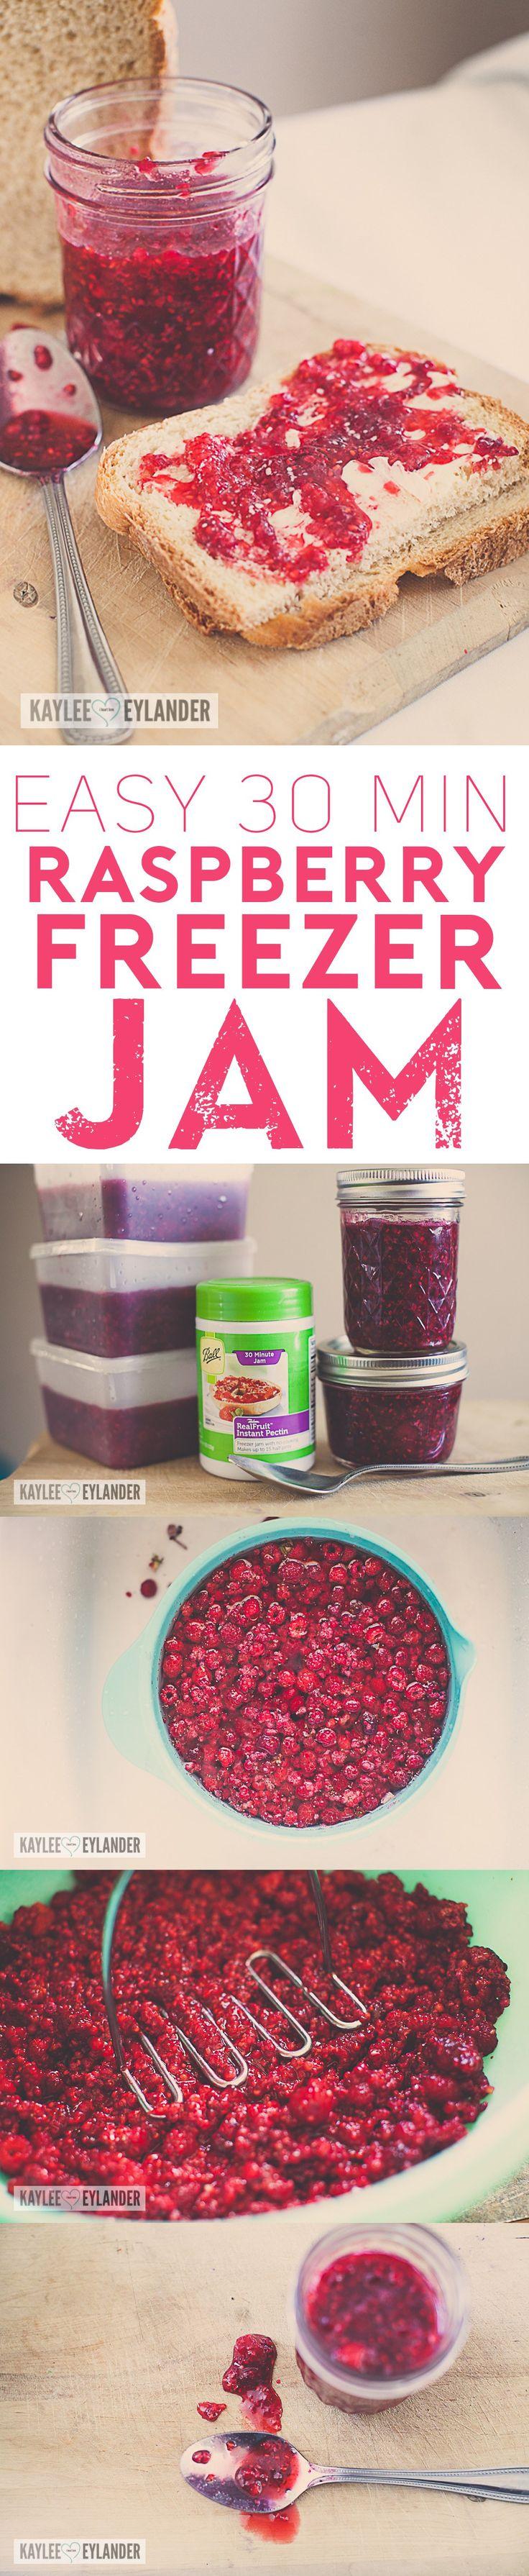 Easy Raspberry Freezer Jam, The easiest Freezer jam that your family will LOVE! Raspberry Jam Recipe